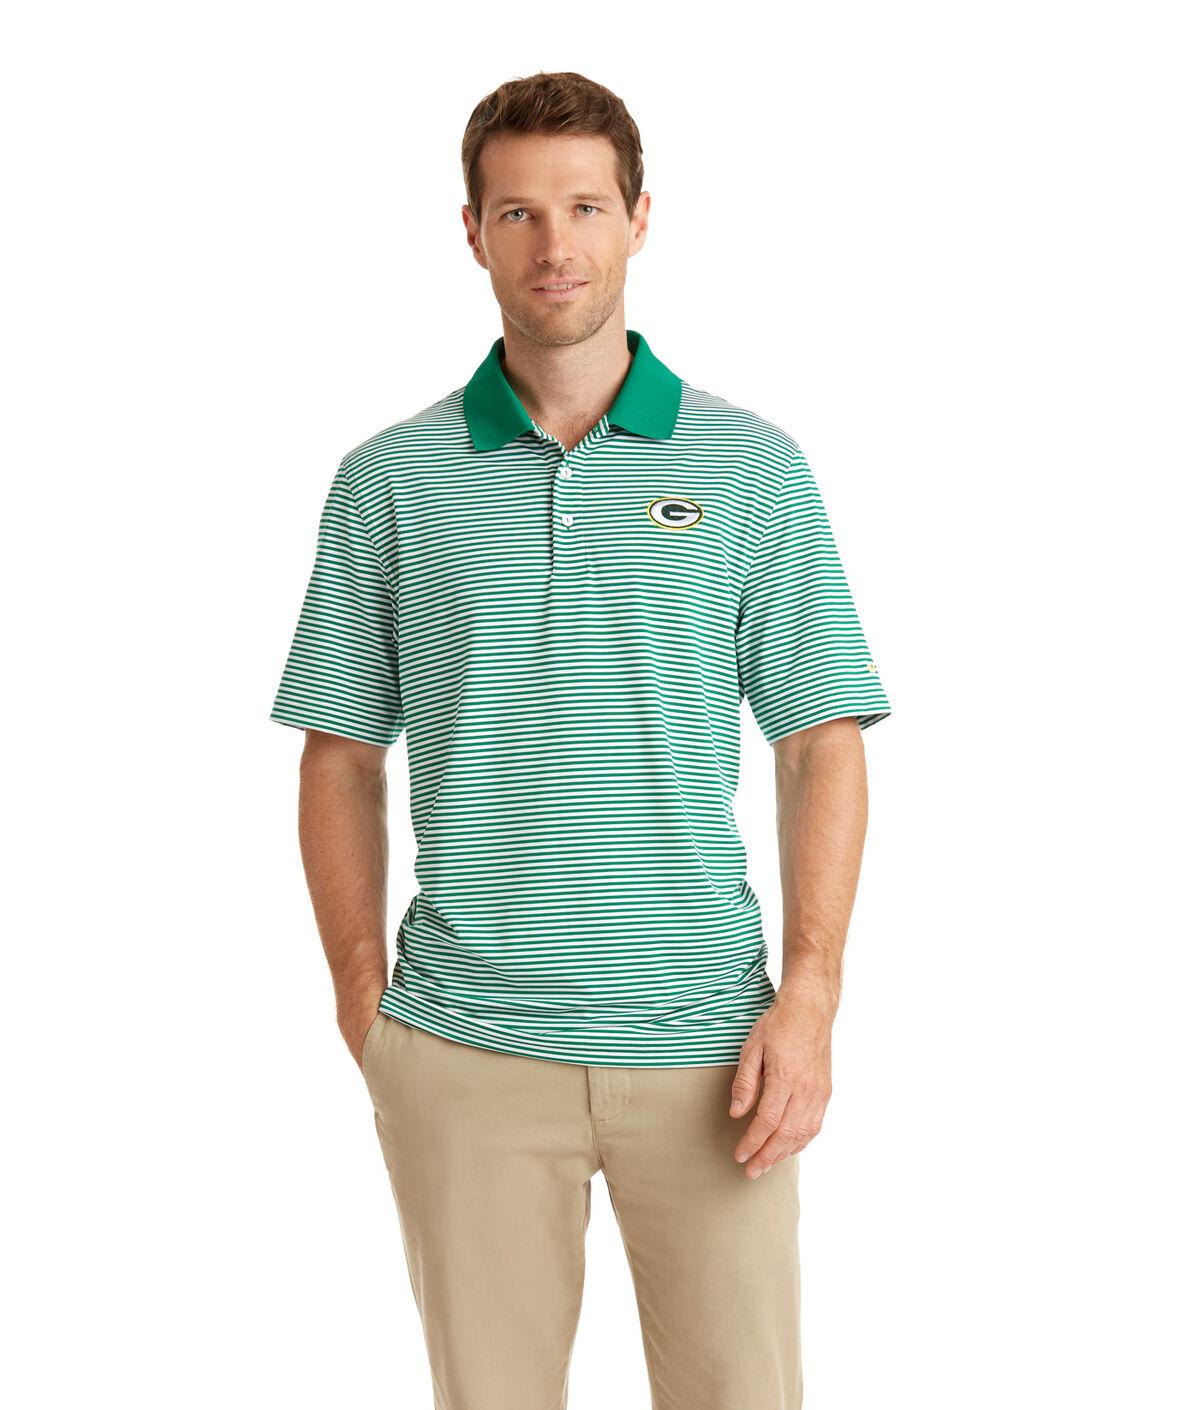 Green Bay Packers Womens Polo Shirt Rldm